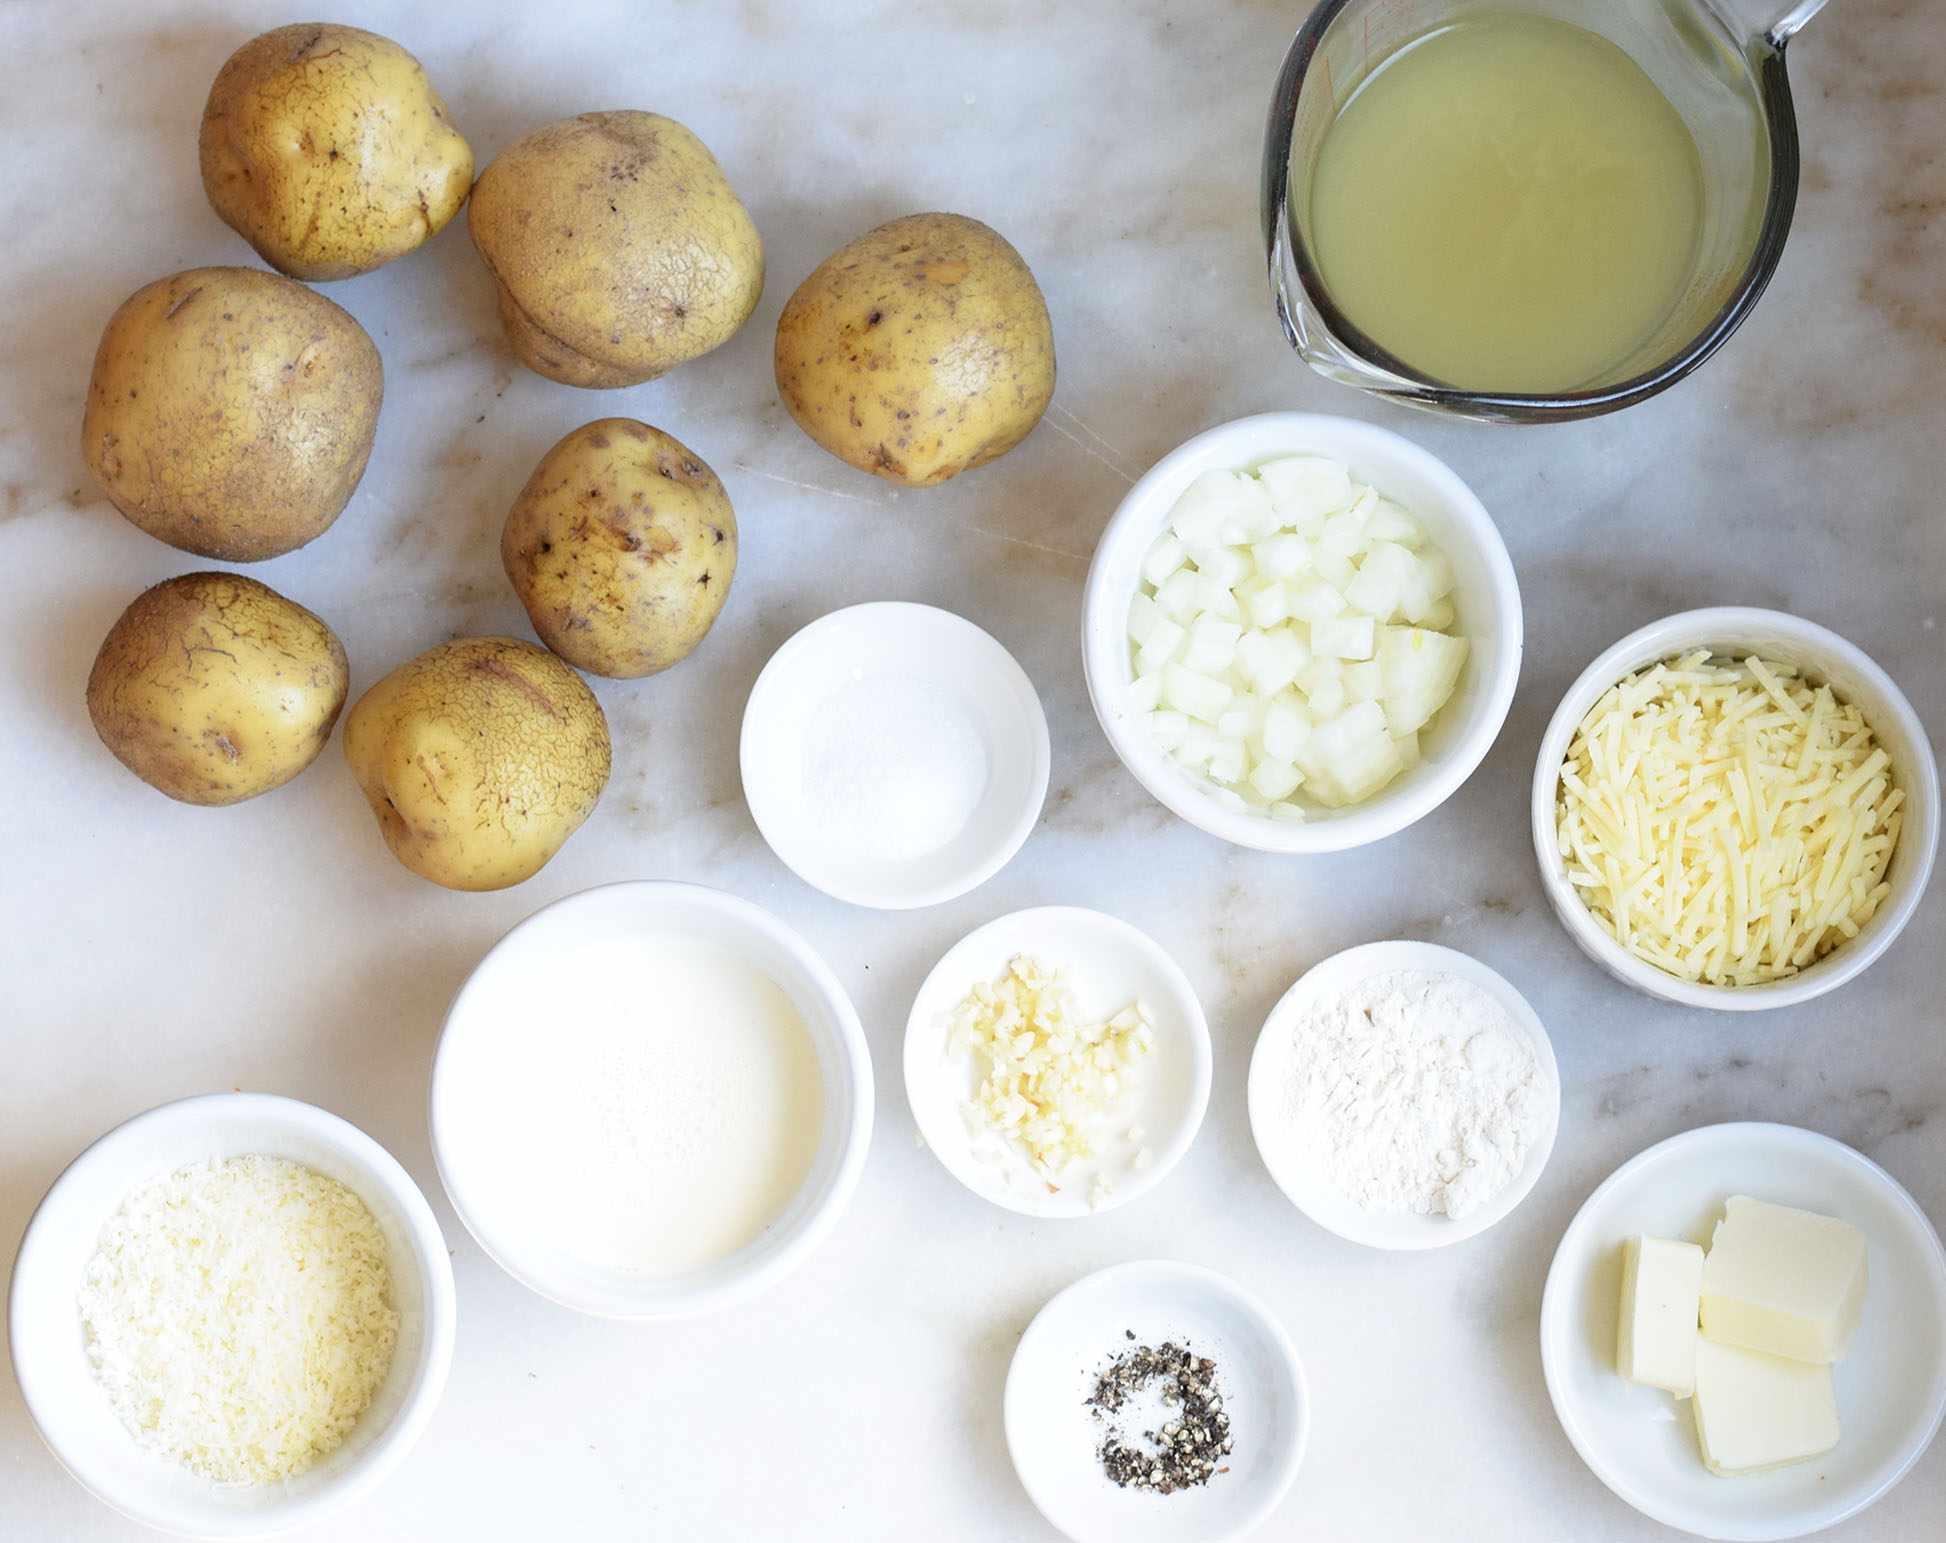 Ingredients for au gratin potatoes